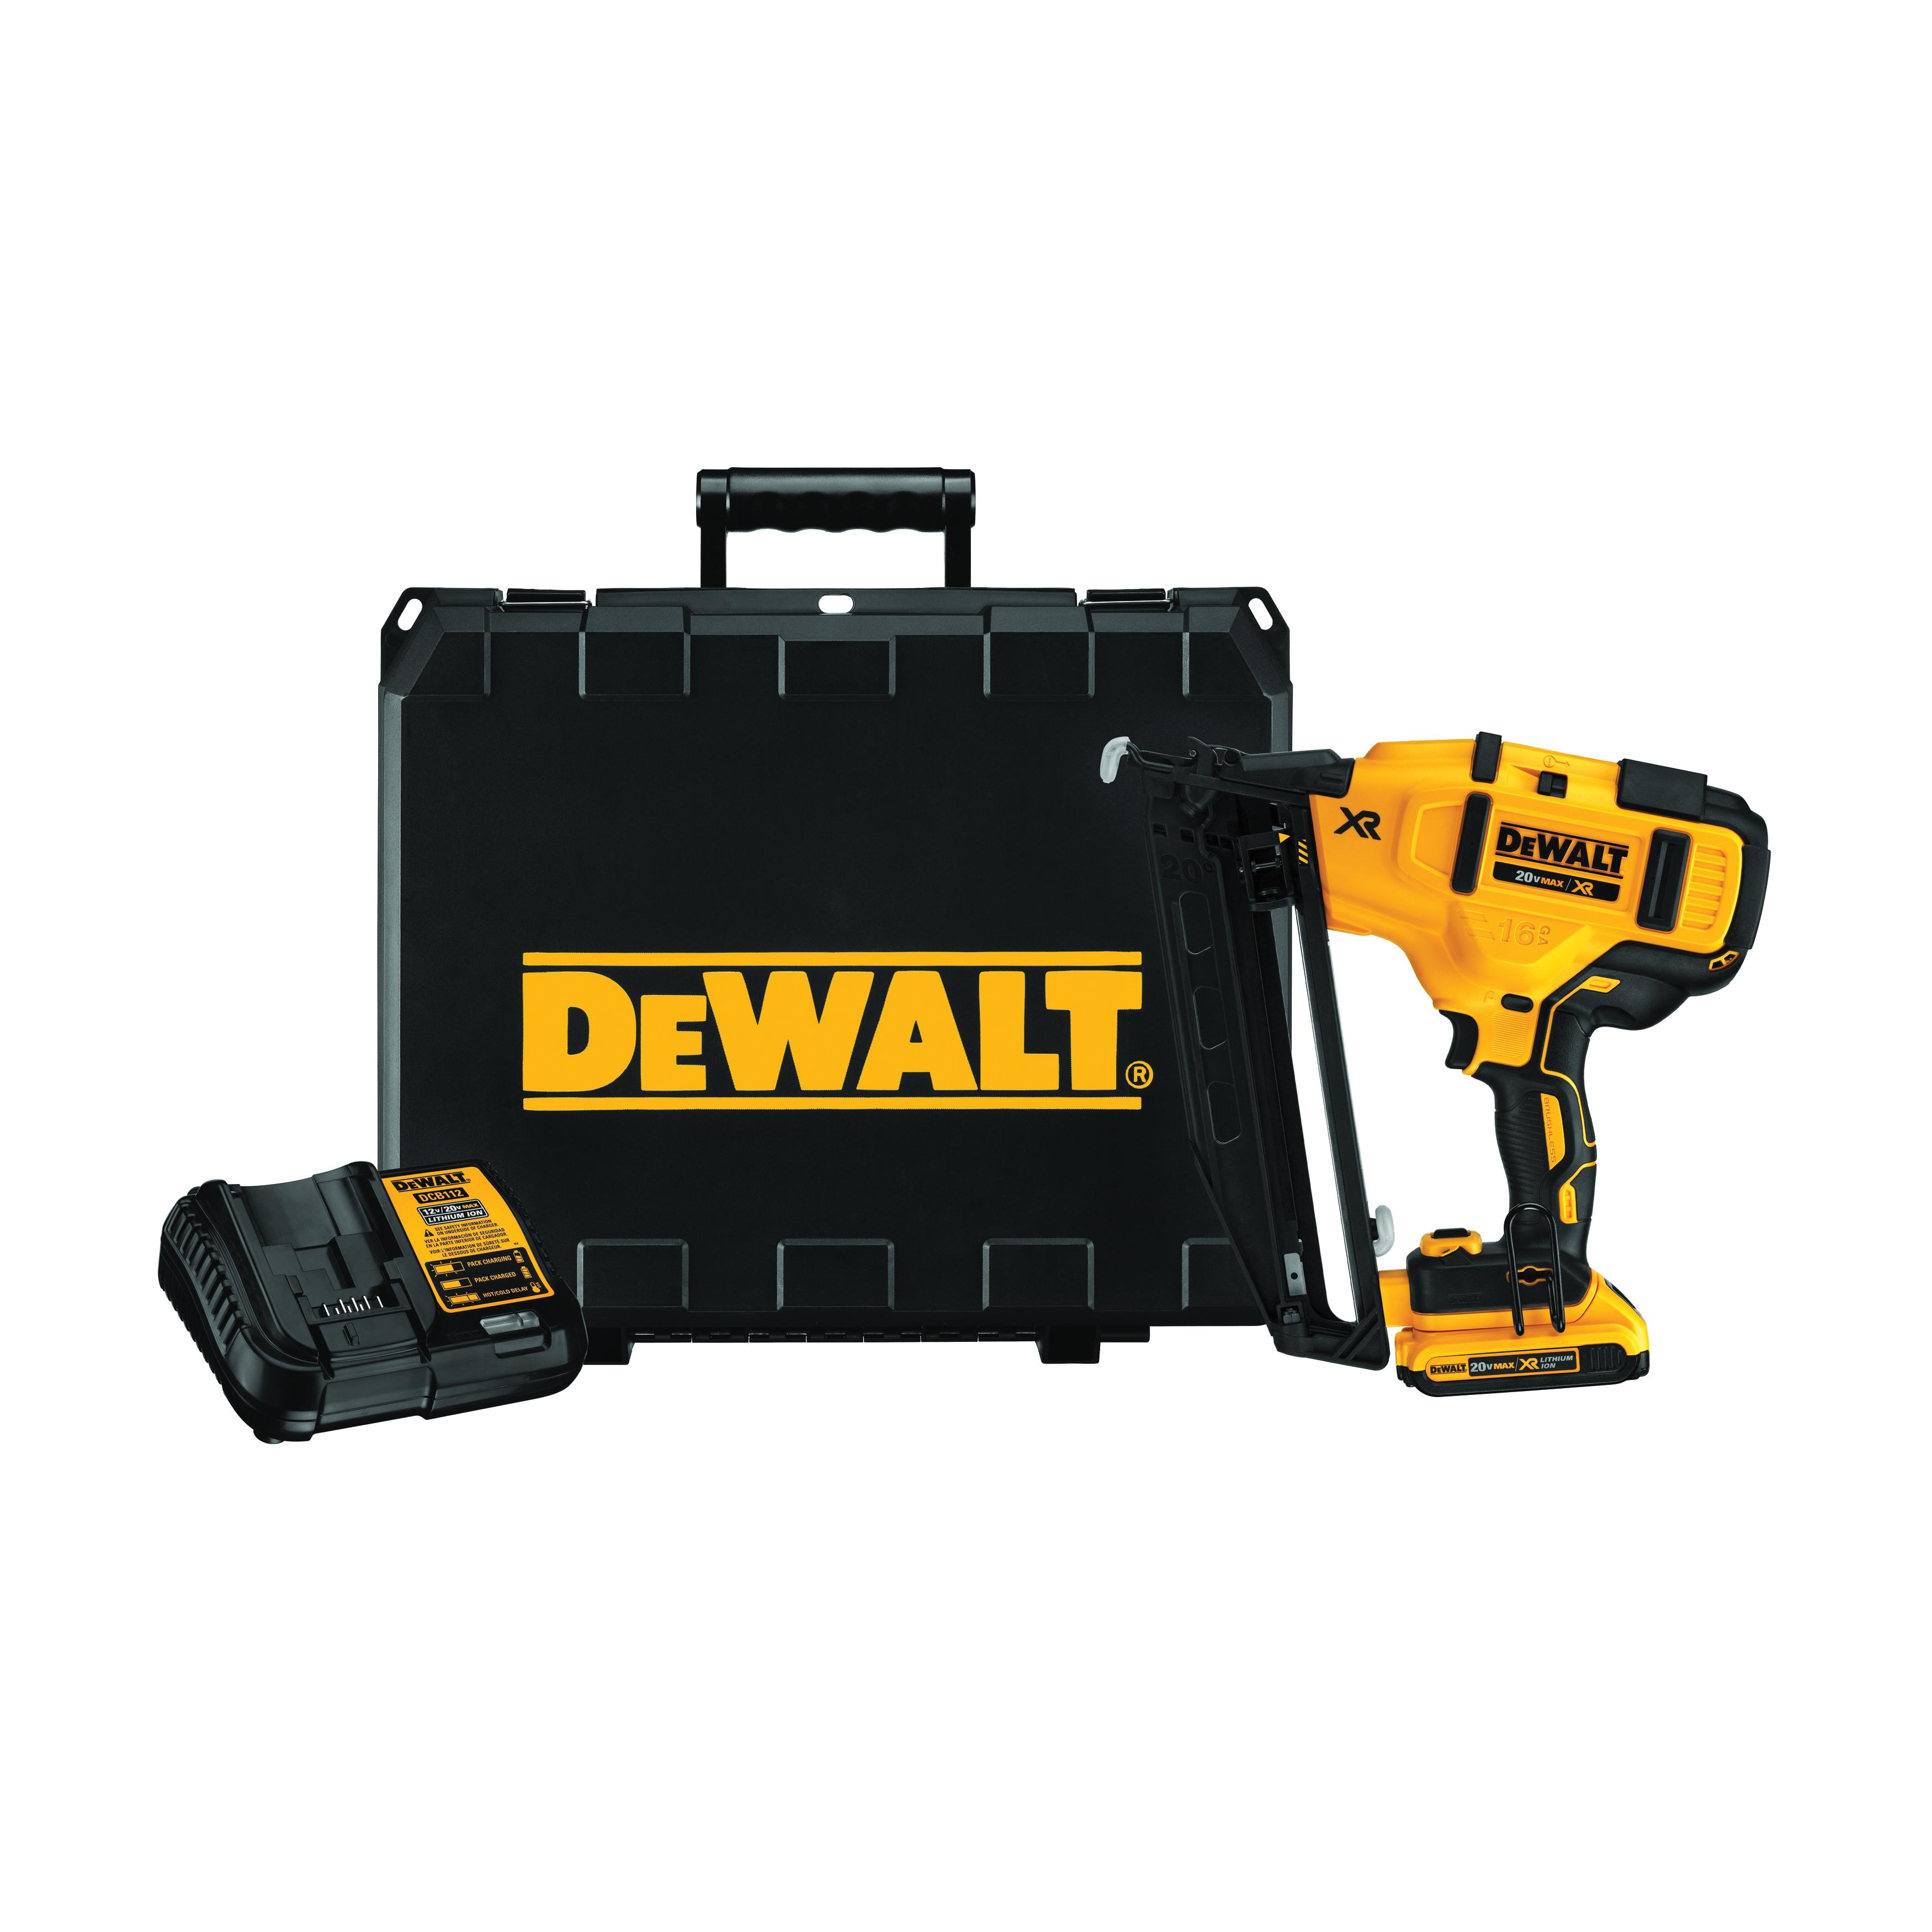 DeWALT® 20V MAX* DCN660D1 Brushless Cordless Finish Nailer Kit, 1-1/4 to 2-1/2 in Fastener, 110 Nails Magazine, 11.7 in OAL, Battery